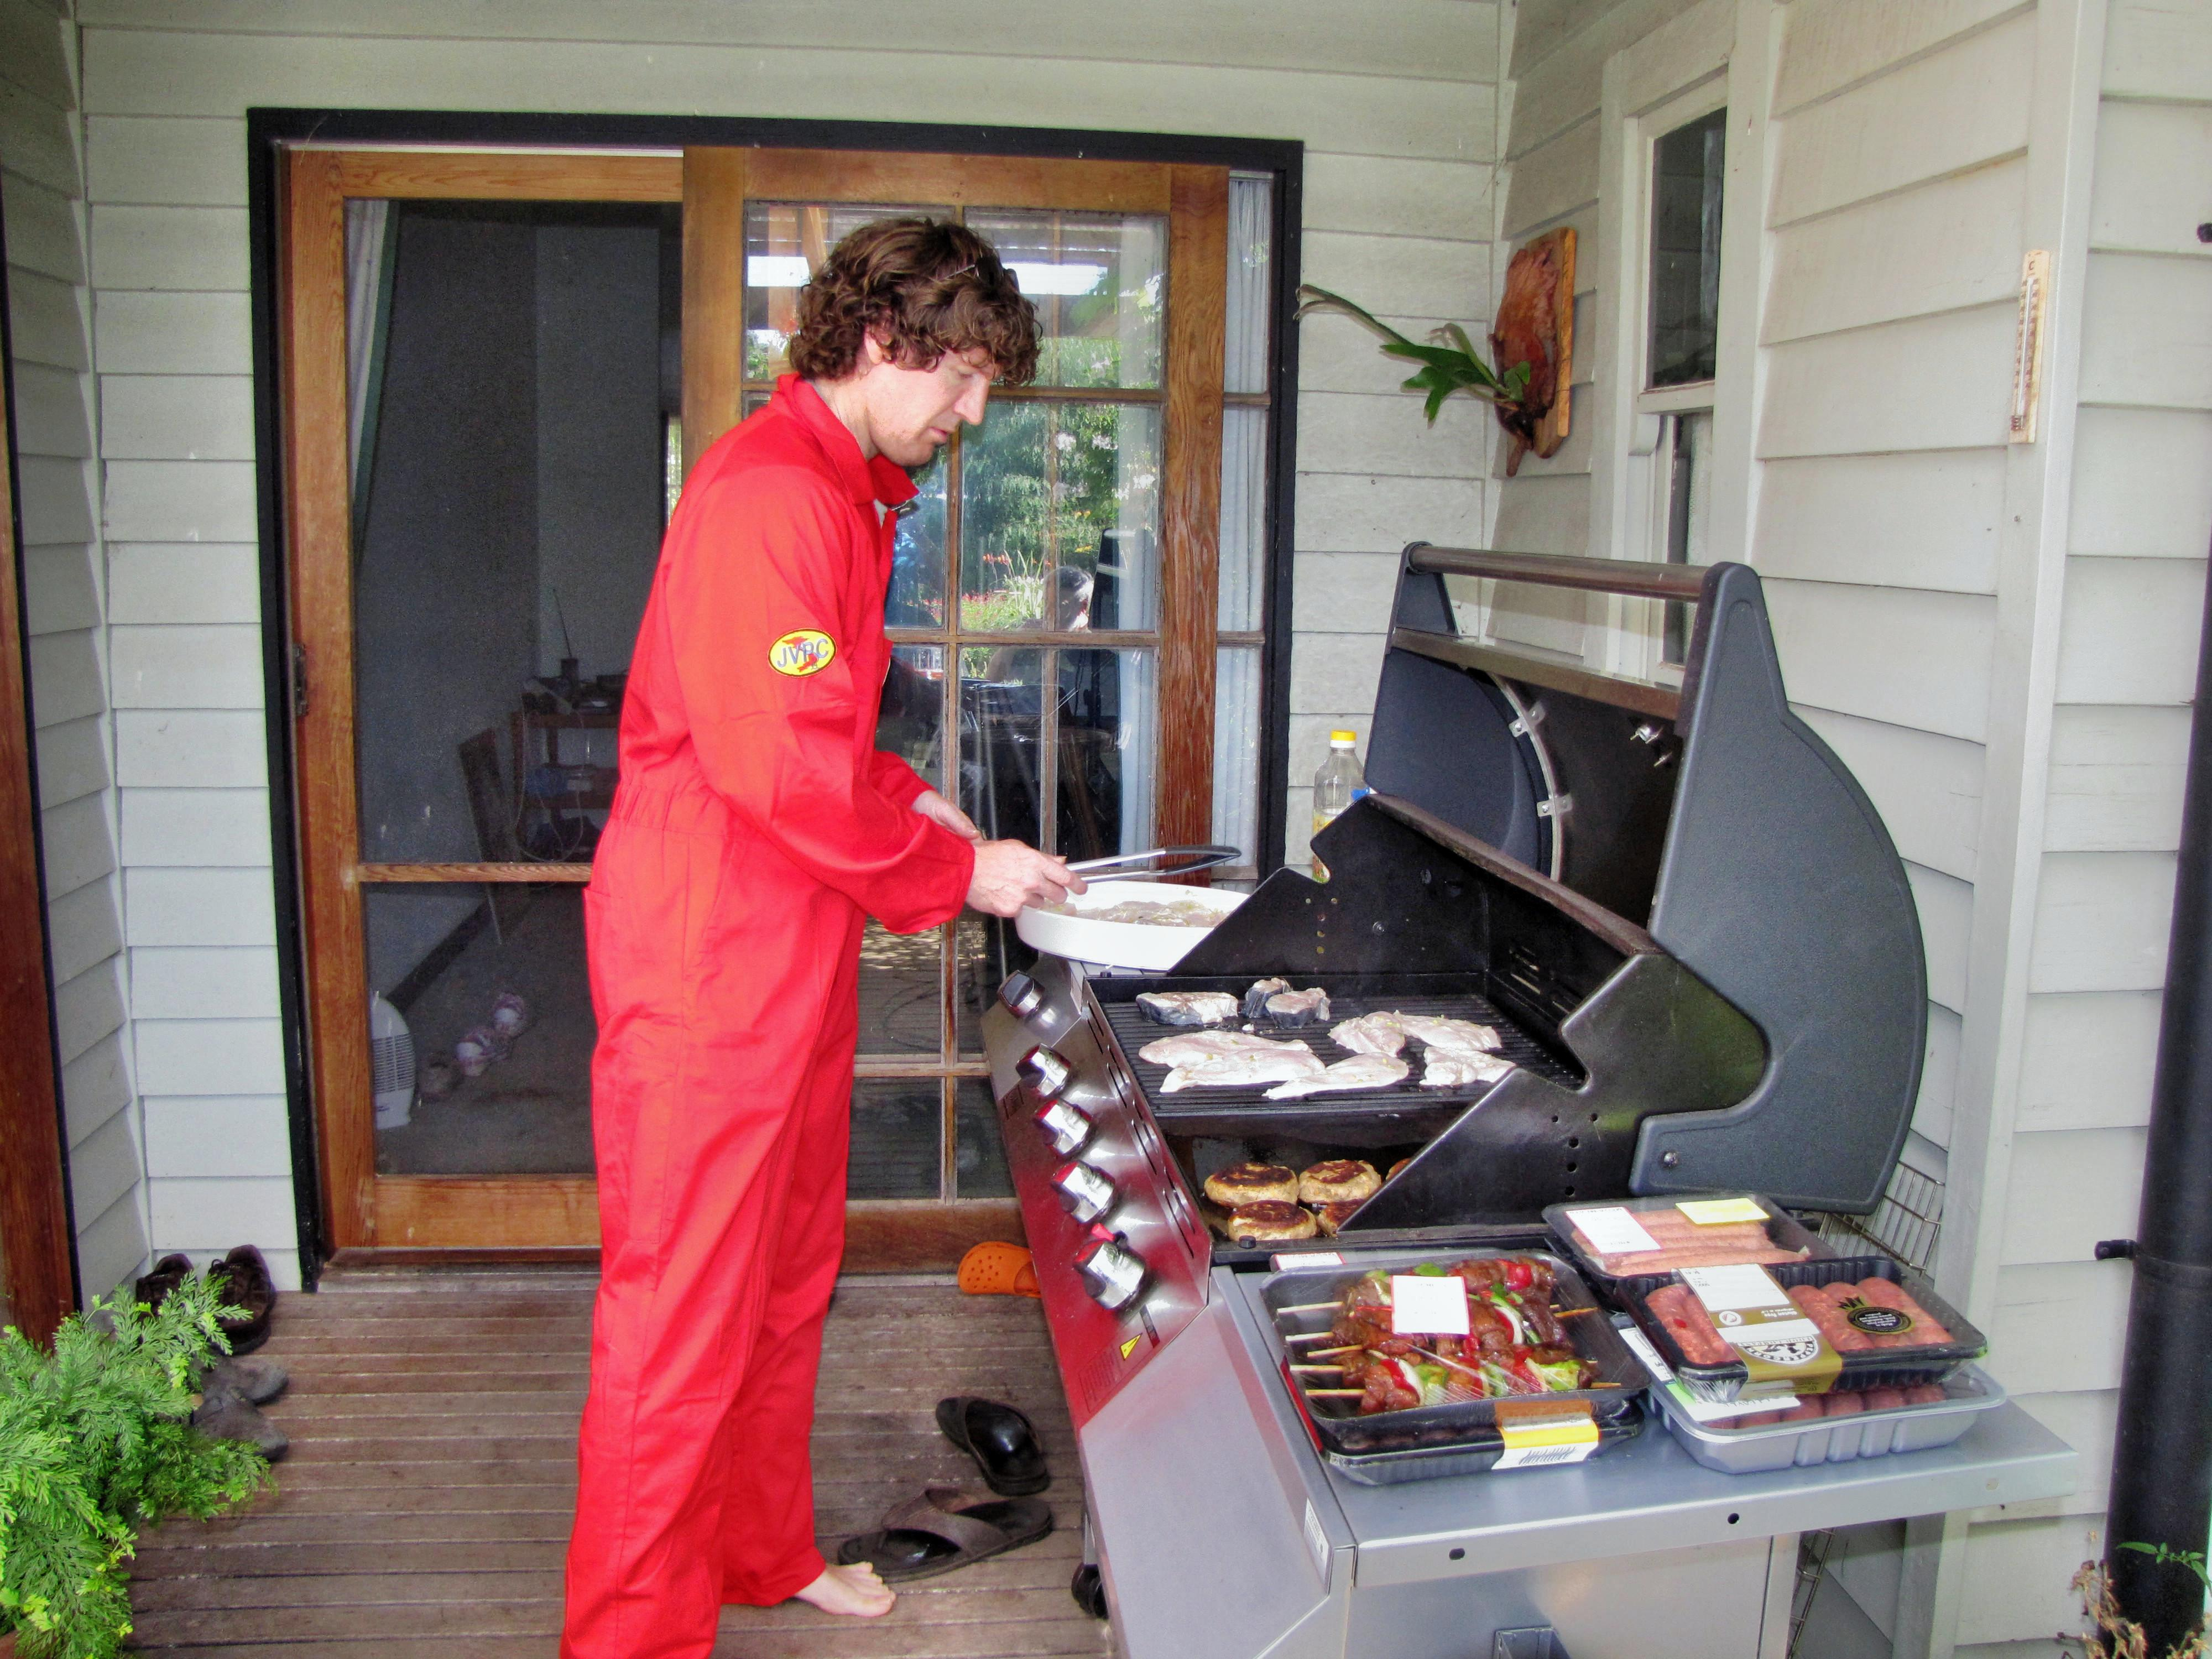 Barbecue-29.jpeg